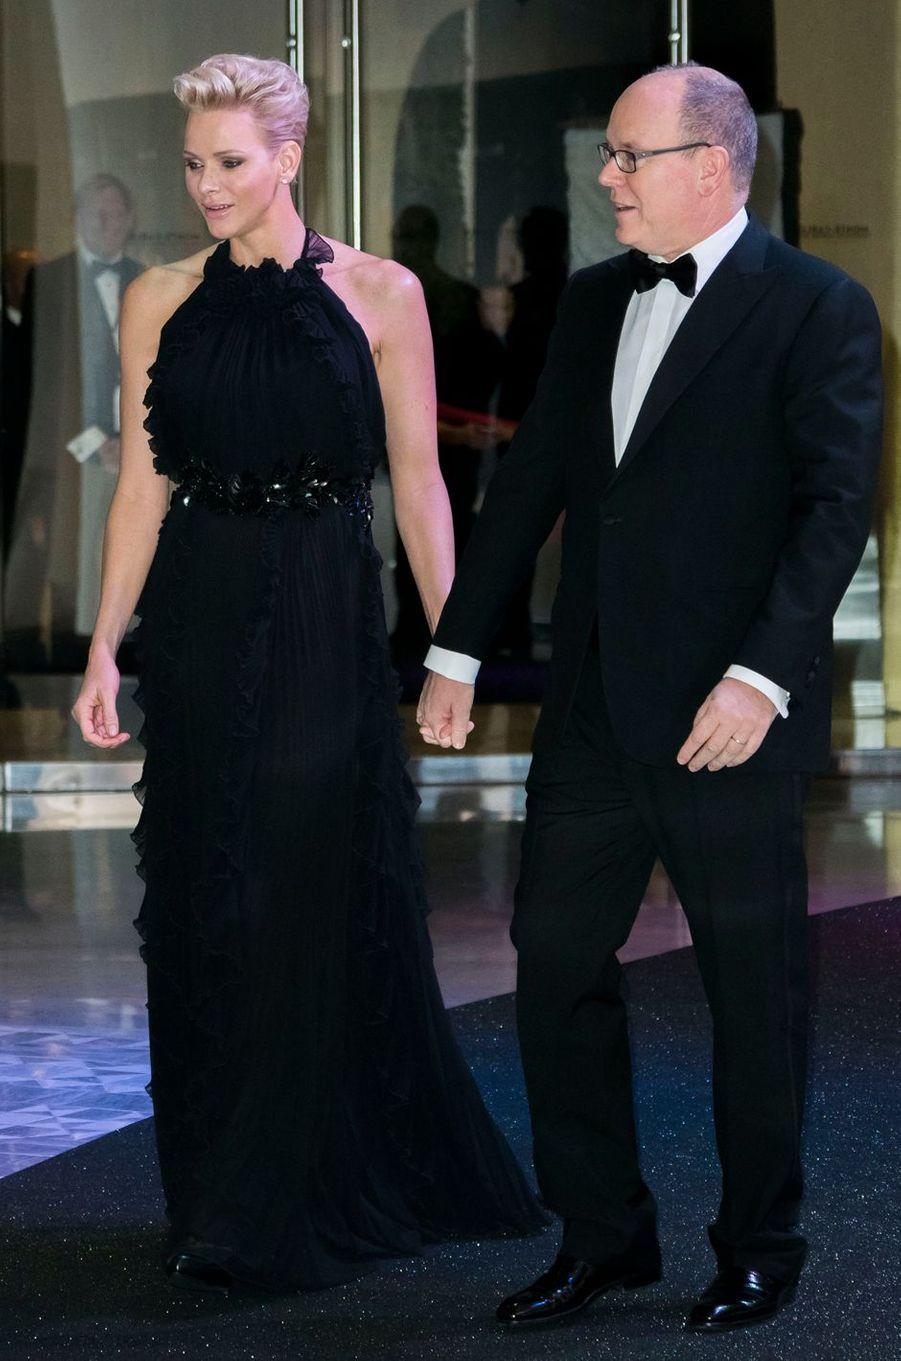 La princesse Charlène et le prince Albert II de Monaco à Monaco, le 26 novembre 2017